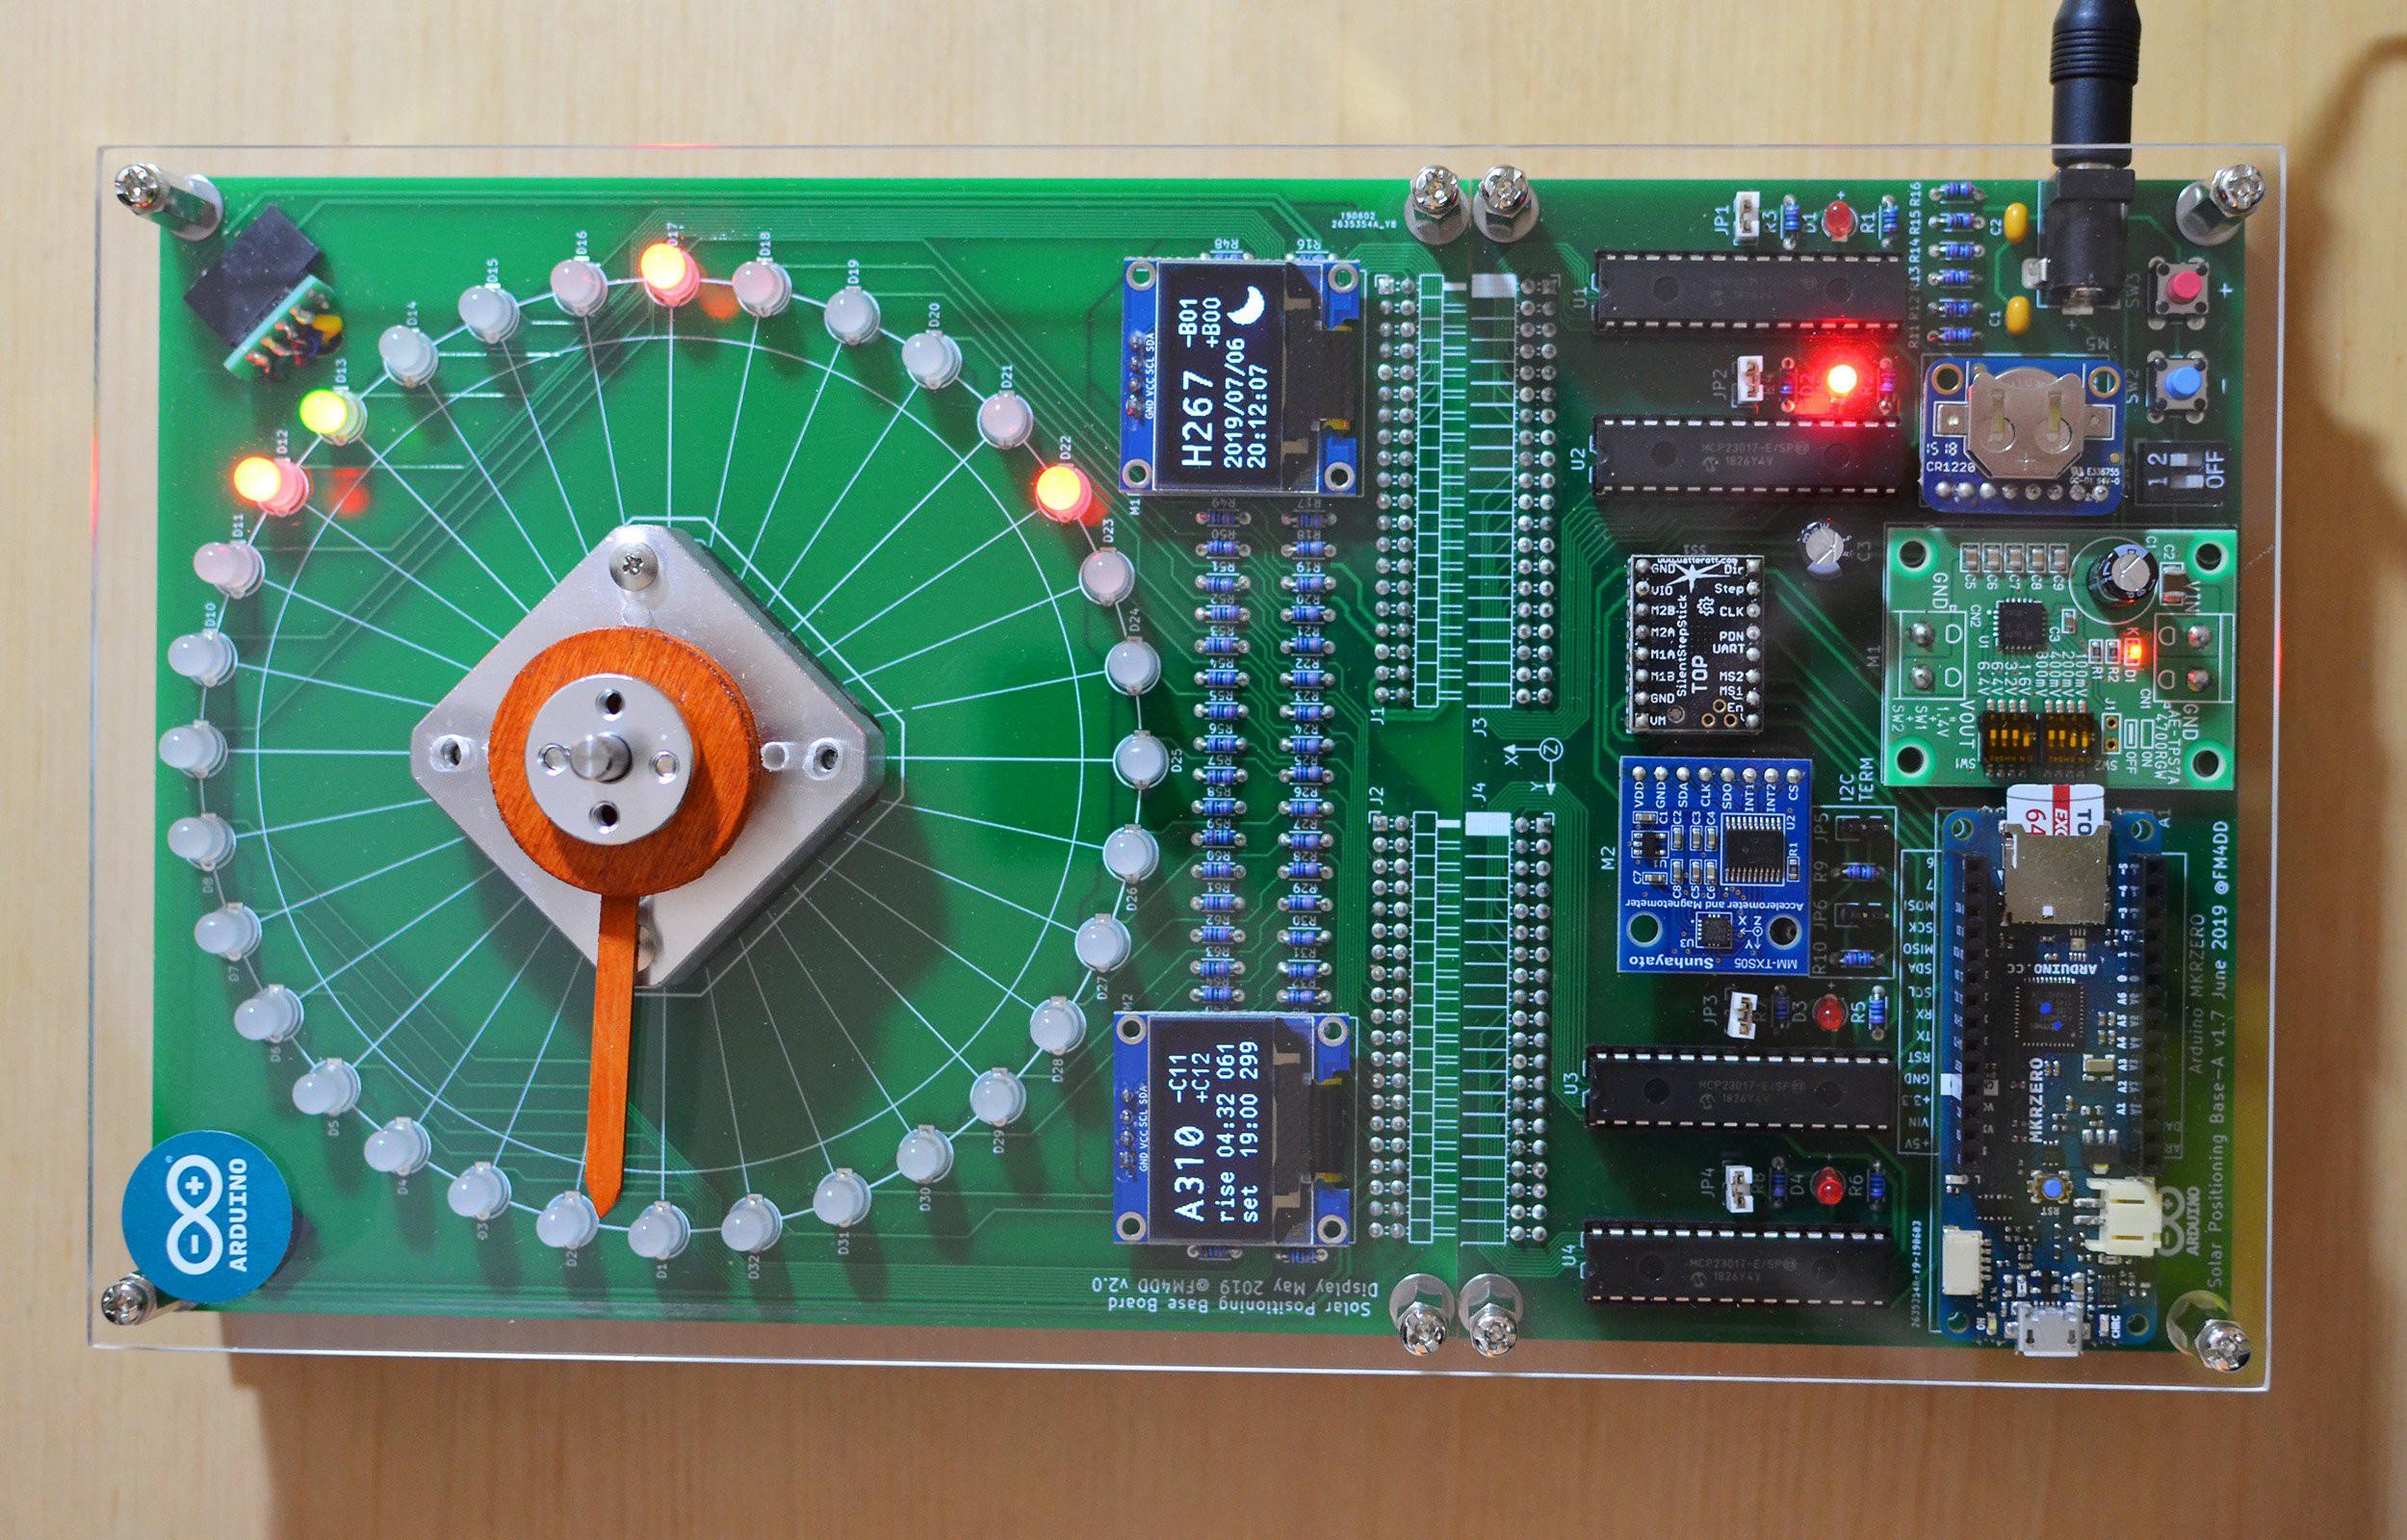 SunTracker2 第3版,通过调整太阳在天空中的路径来优化太阳系统的能量输出的学习平台